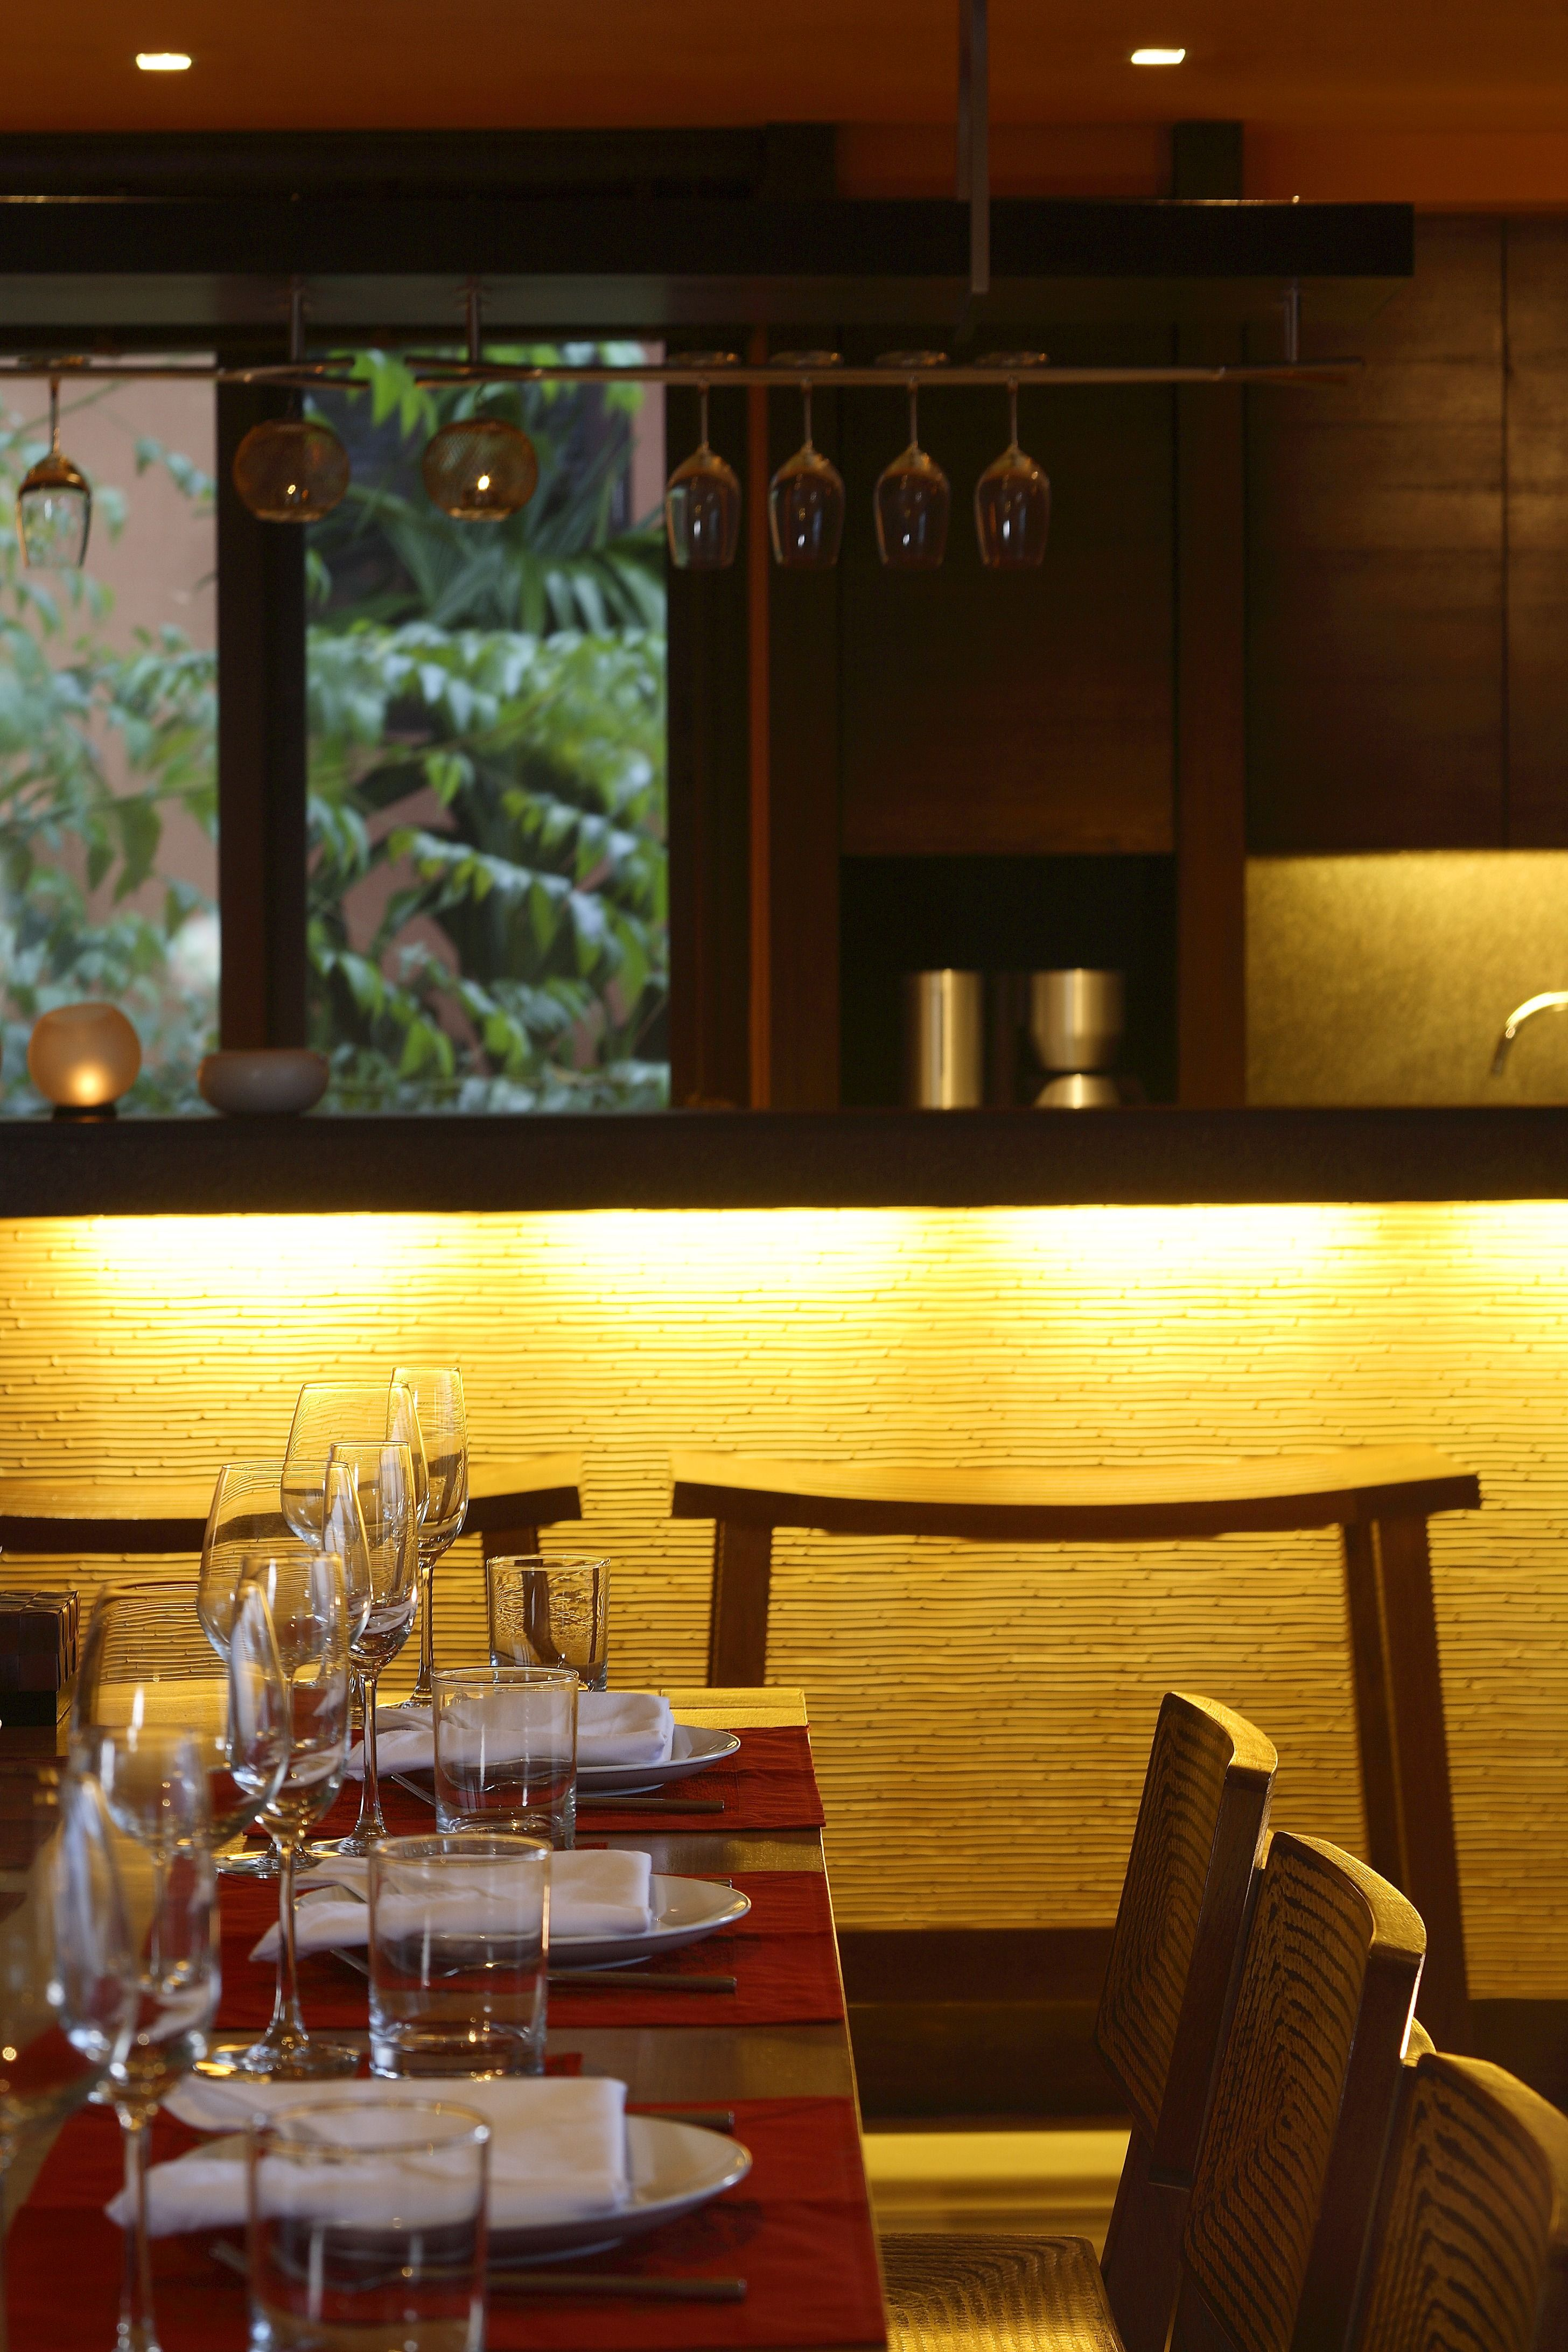 Cost To Install Light Fixture Pendant Recessed Bathroom Lighting Installing Light Fixture Dining Inspiration Light Fixtures